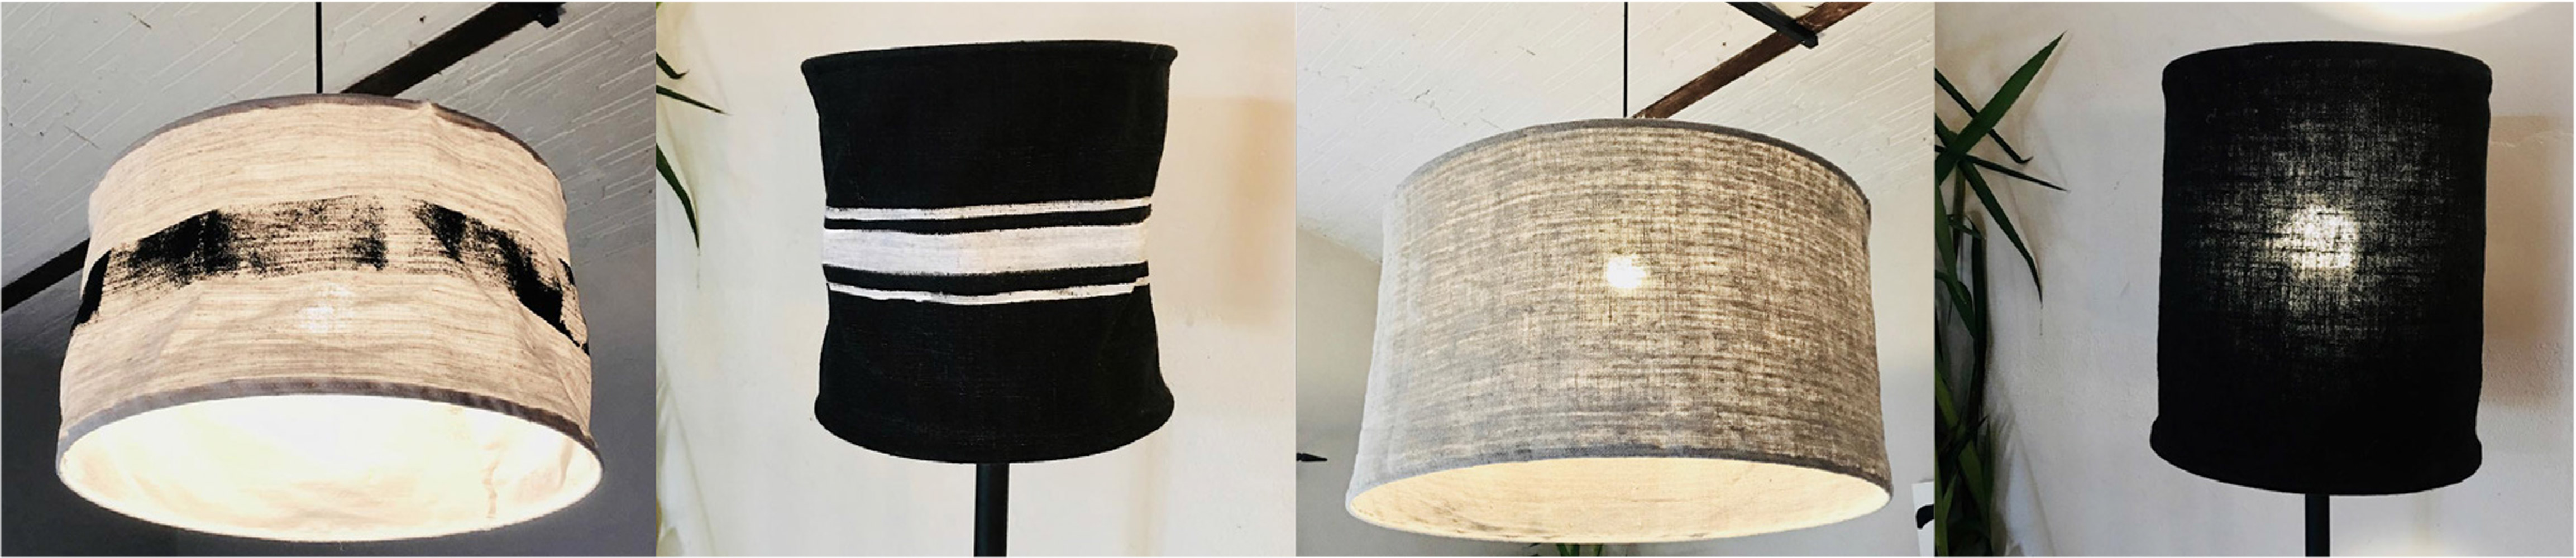 vitrine-deco-ete-mannissa-luminaires